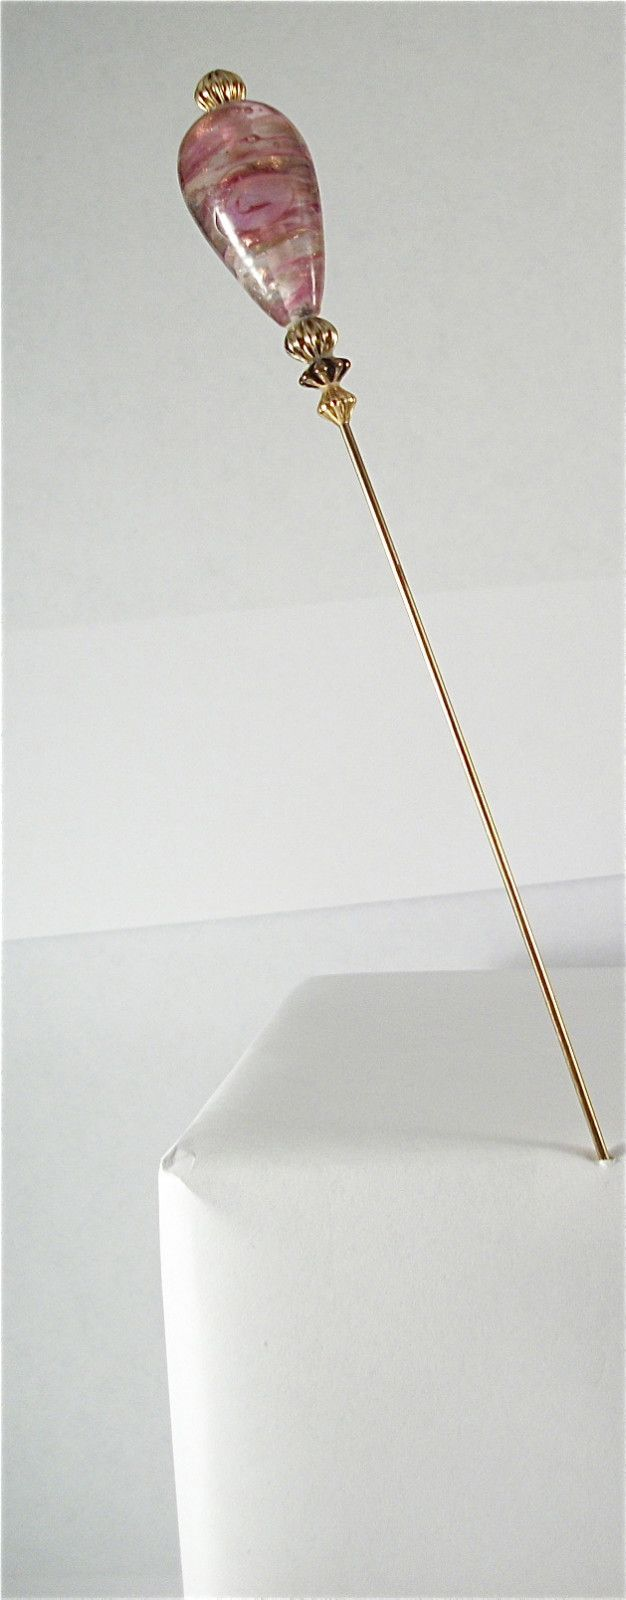 Stick pins for crafts - Stick Pins For Crafts 7